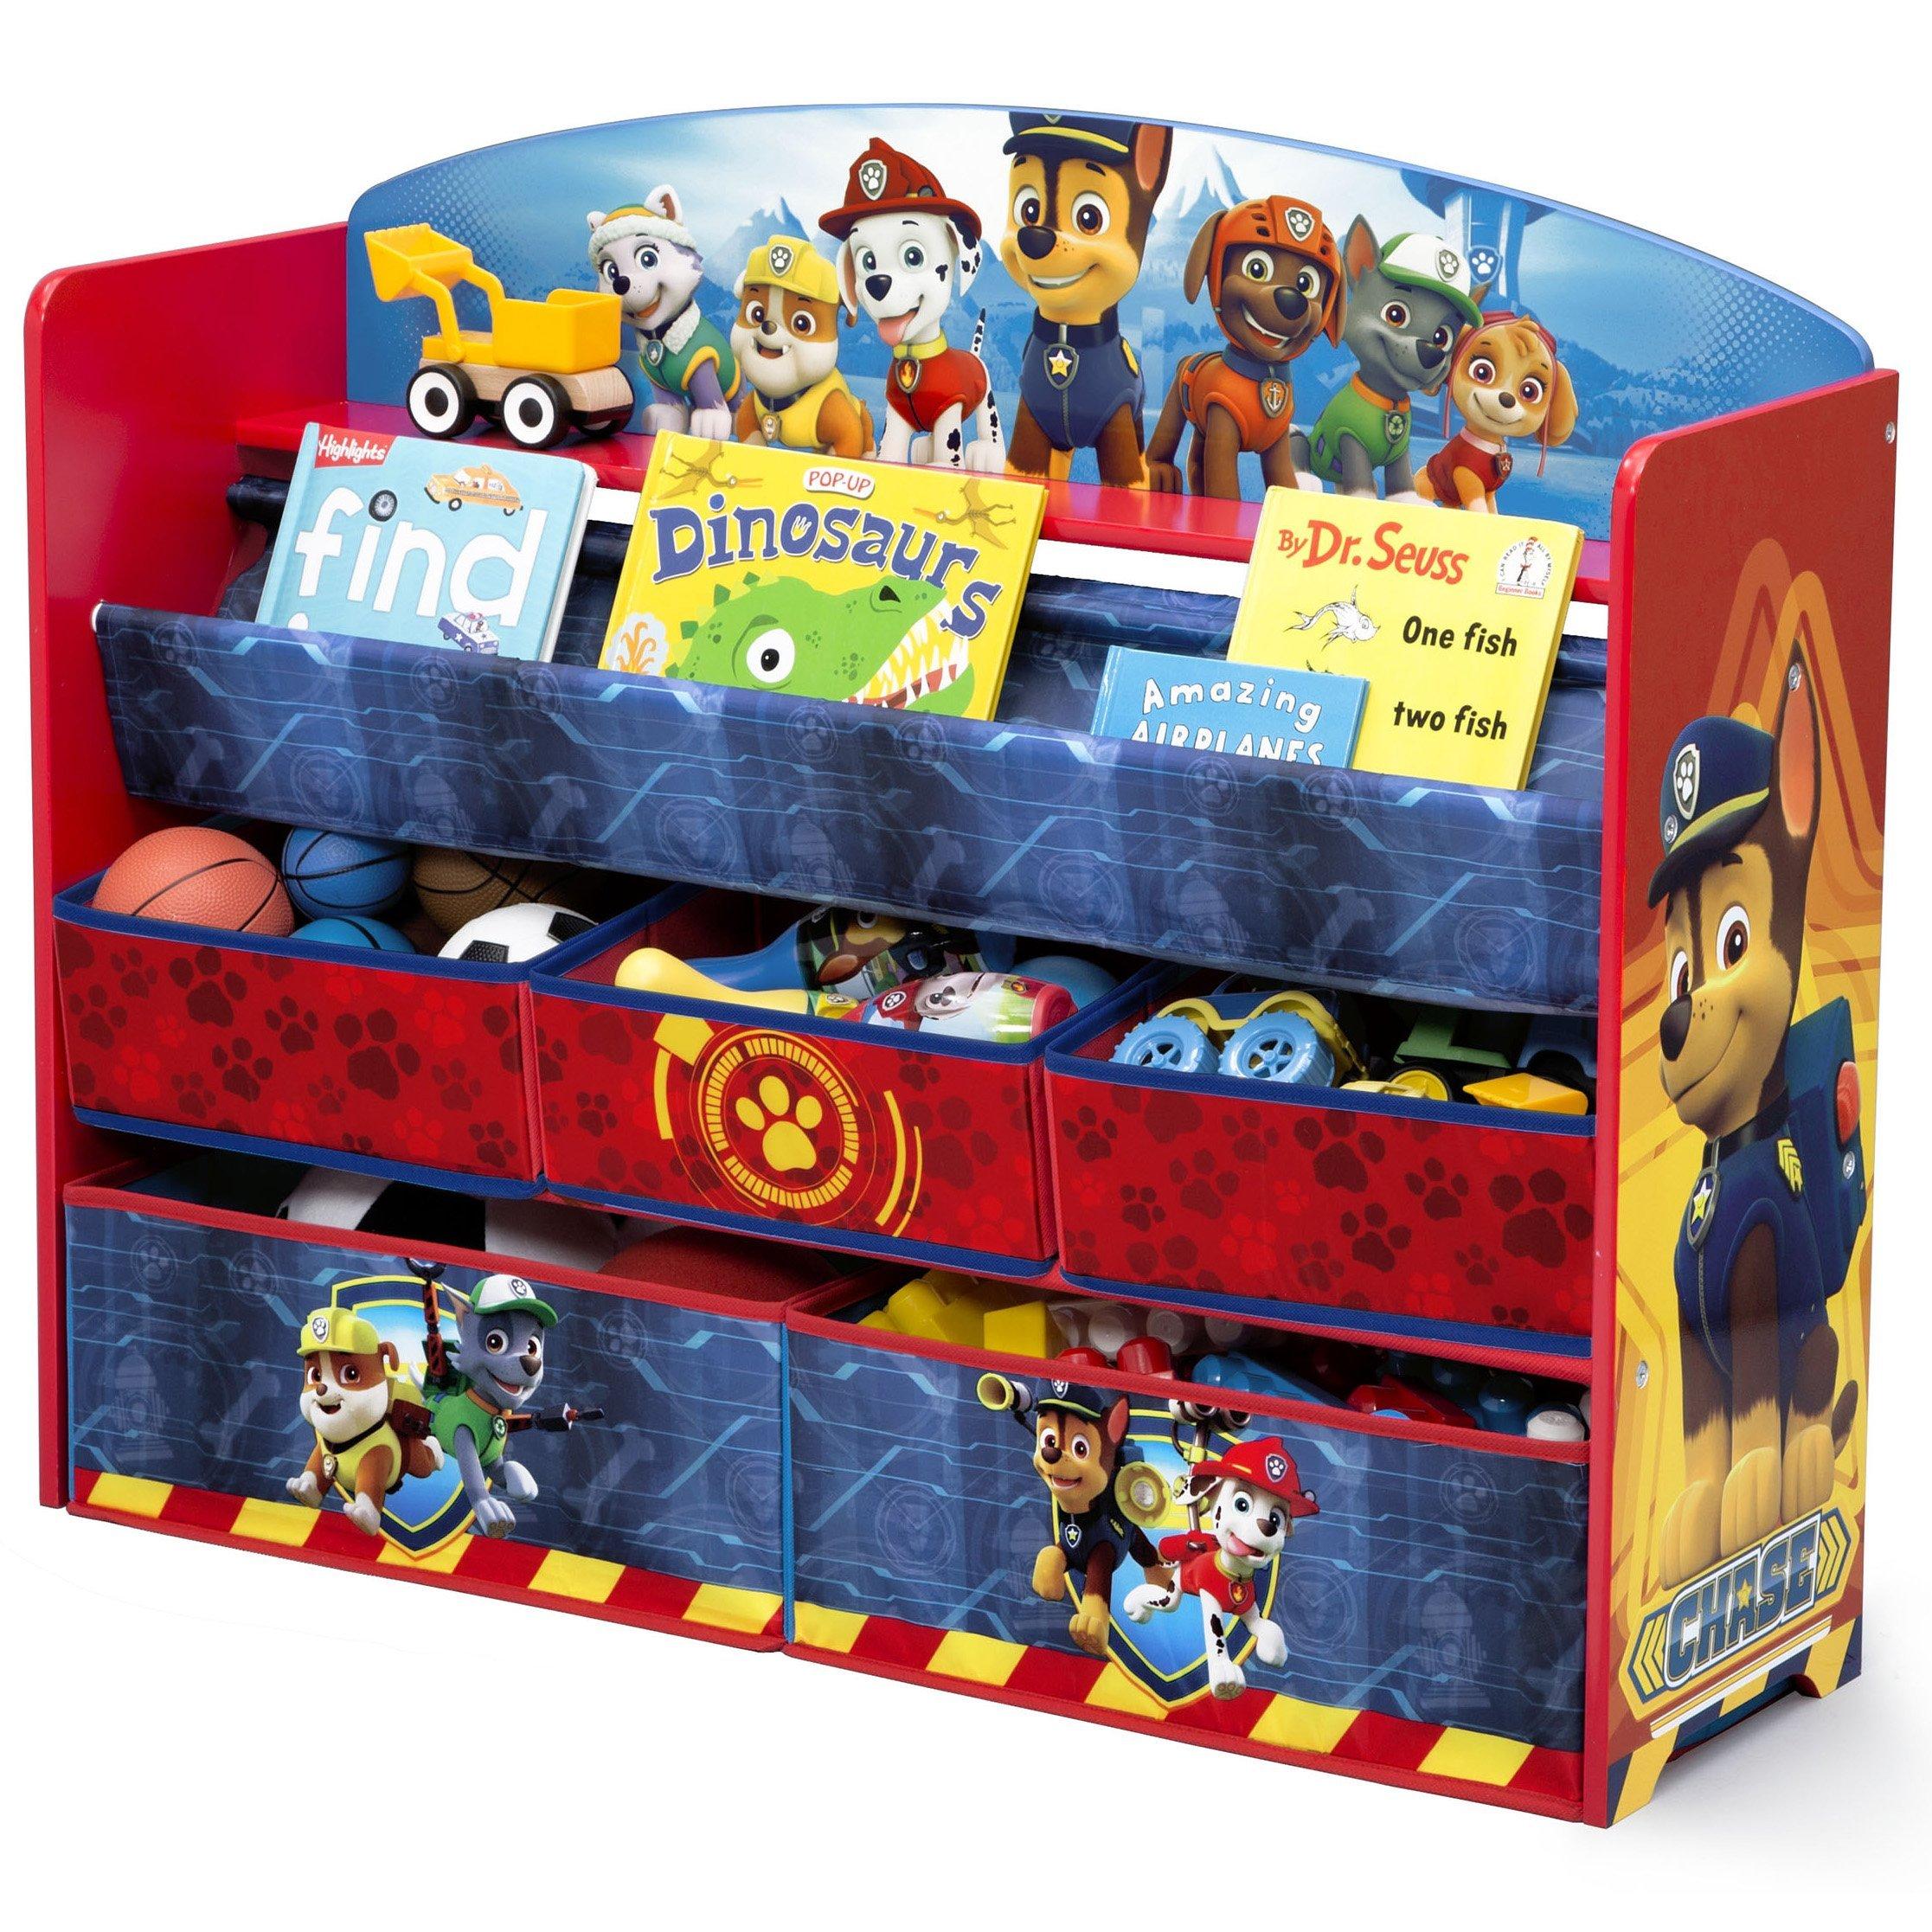 Delta Children Deluxe Book and Toy Organizer, Nick Jr. PAW Patrol by Delta Children (Image #4)